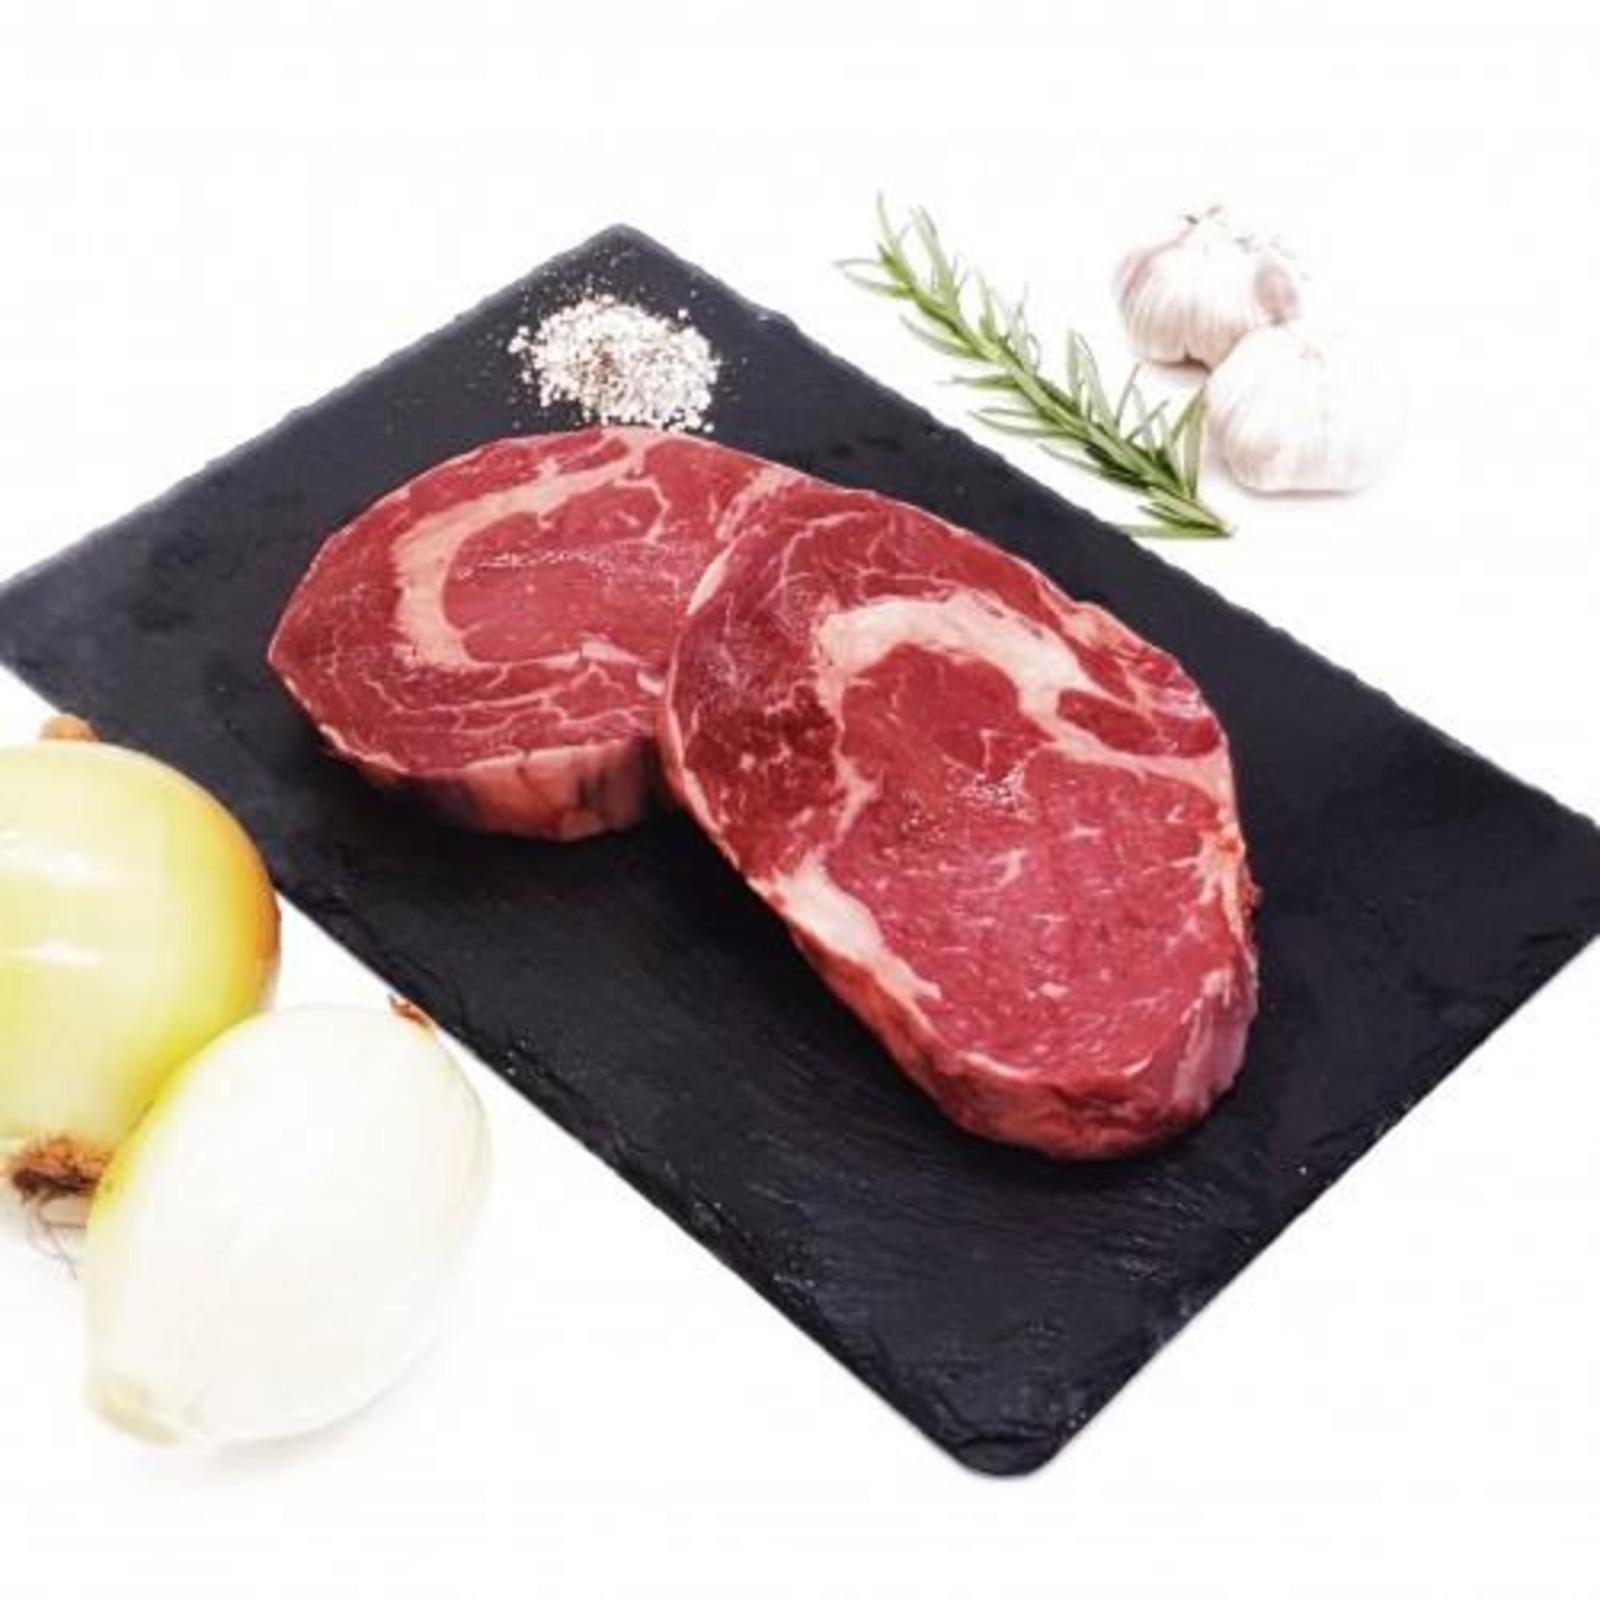 AW'S Market Beef Heel Muscle (shin/shank)